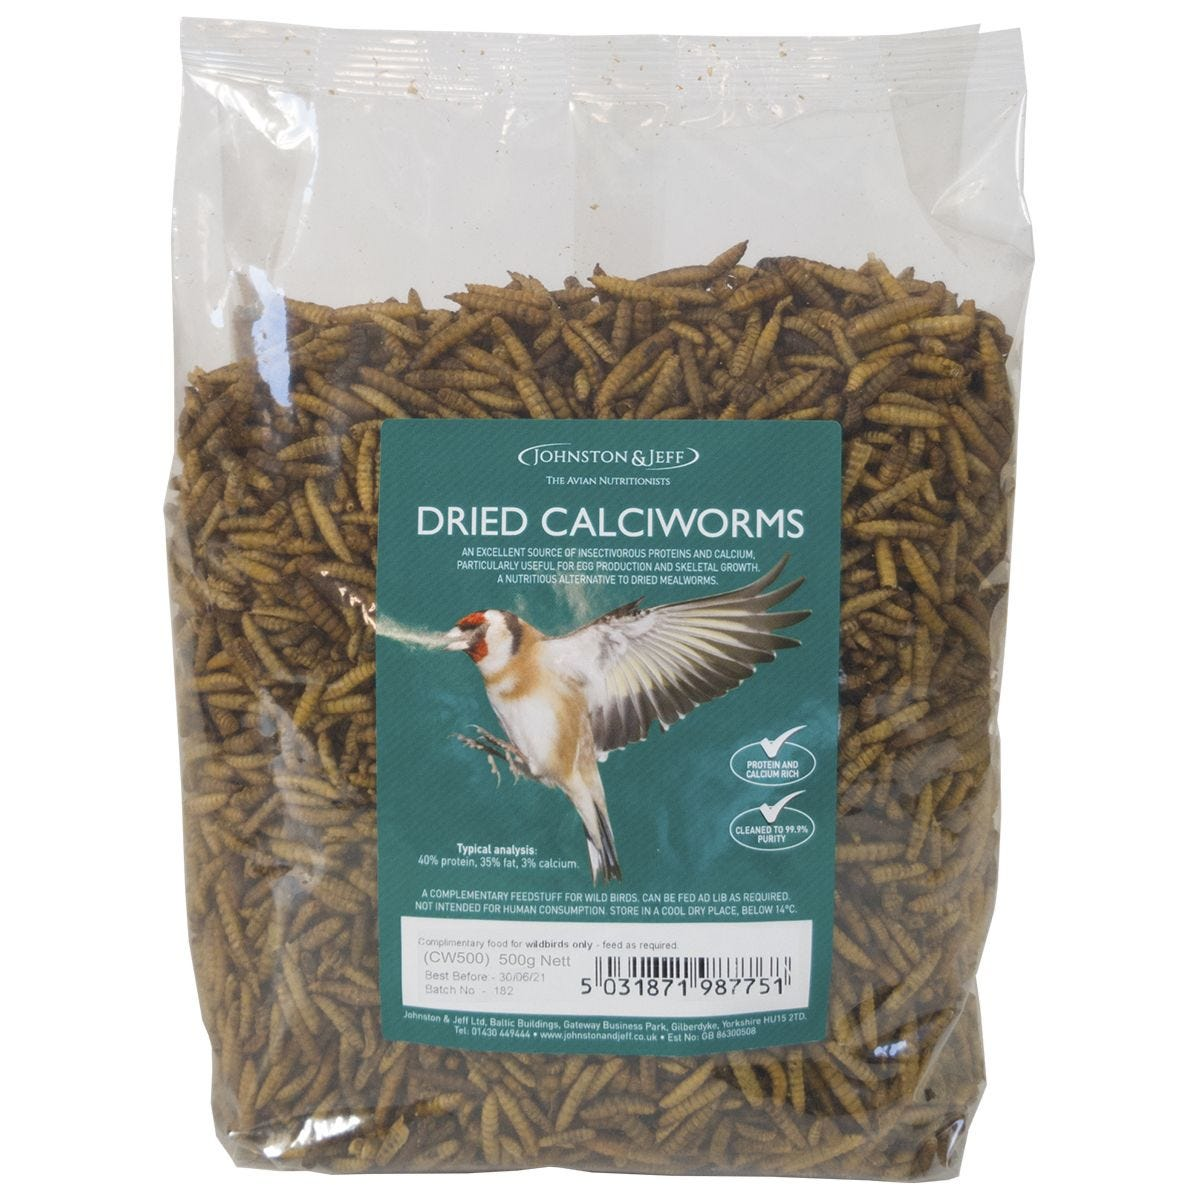 Johnston & Jeff Dried Calciworms Bird Feed 500g